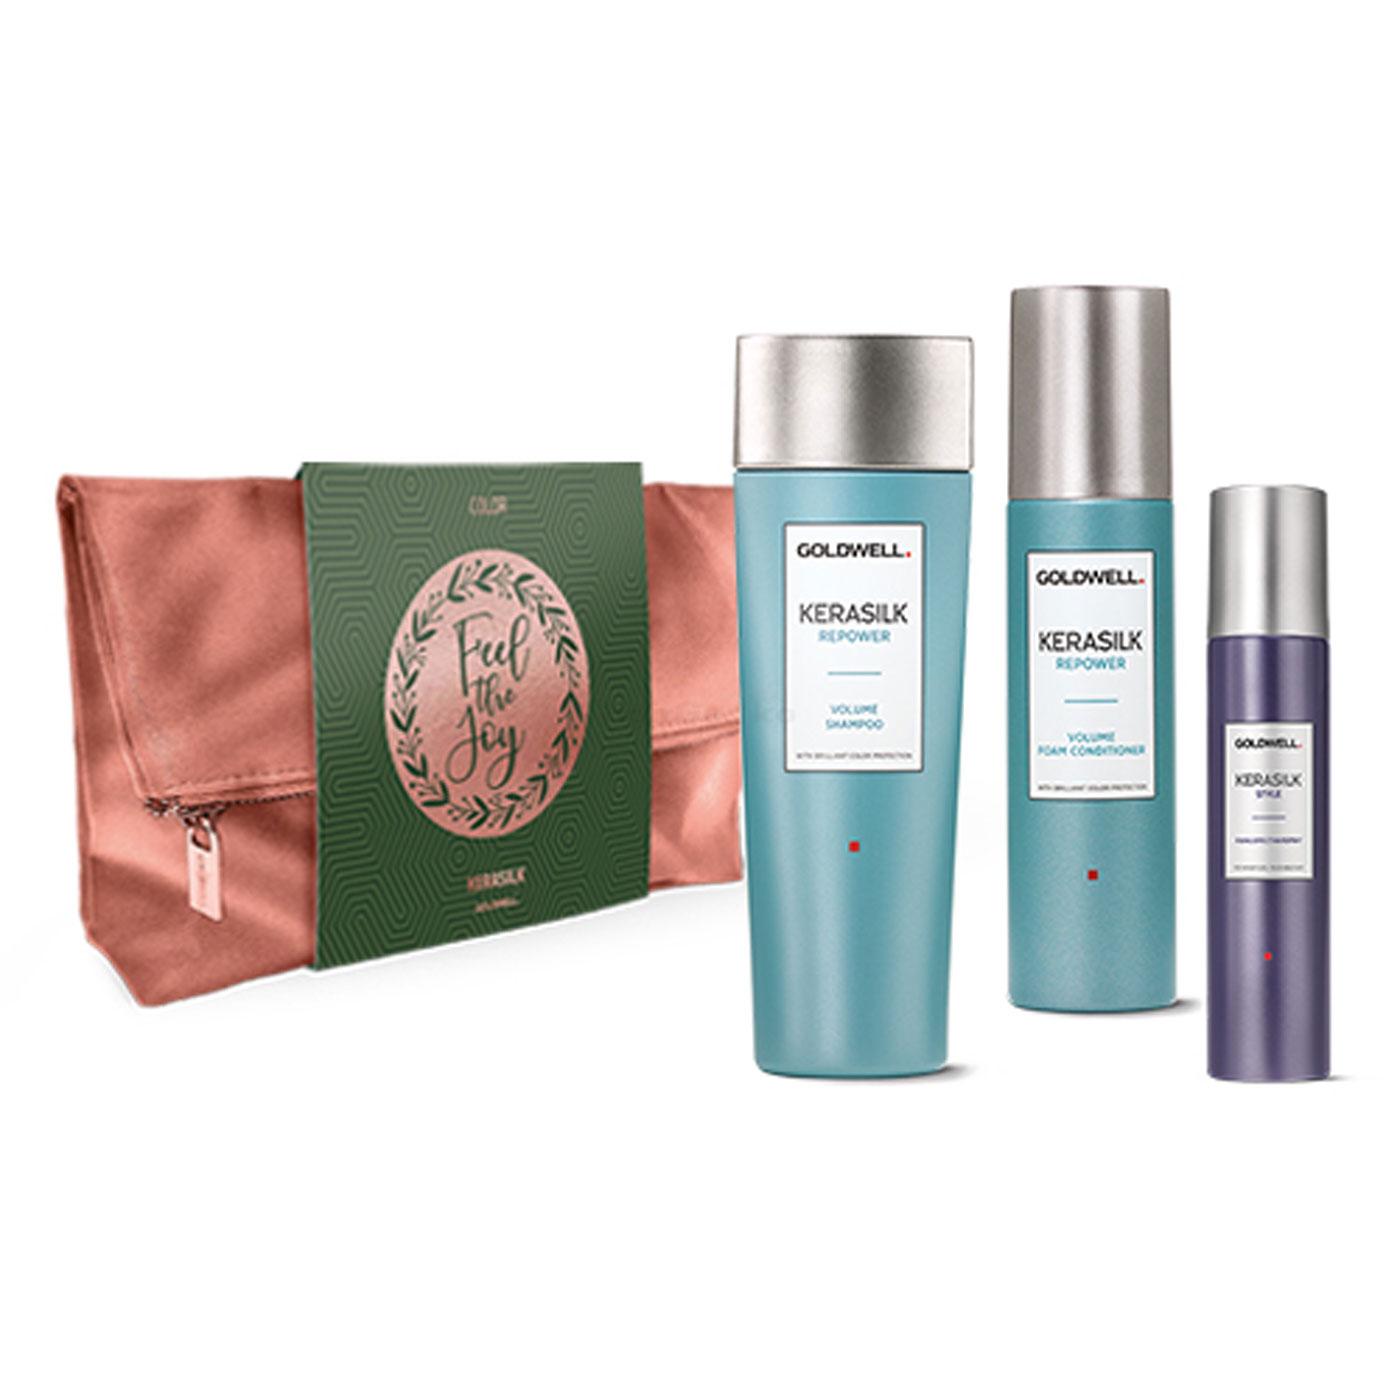 Goldwell Kerasilk Repower Xmas Bag Tasche Set - Repower Volume Shampoo 250ml + Repower Foam Conditioner 150ml + Style Texture Refresh Spray 75ml + Tasche